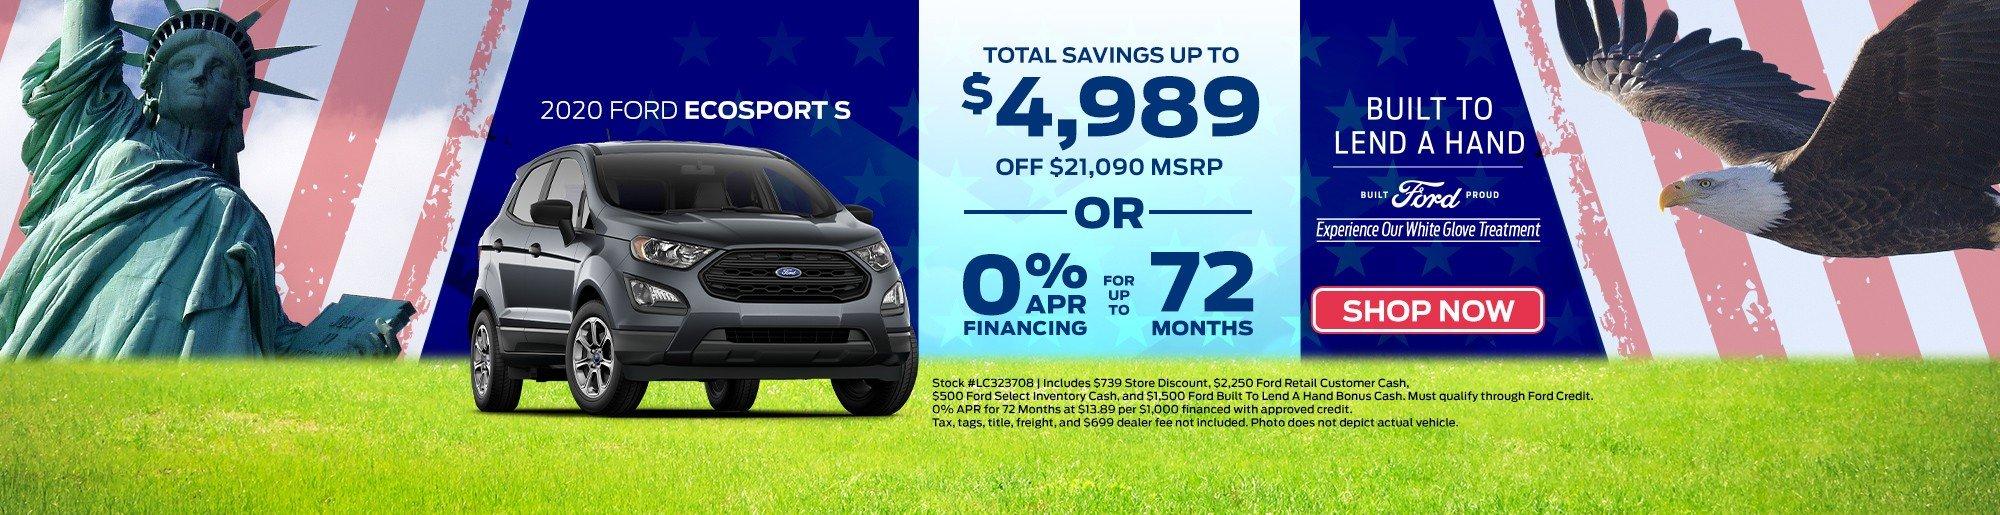 Sale Price Ecosport Leesburg, FL Key Scales Ford